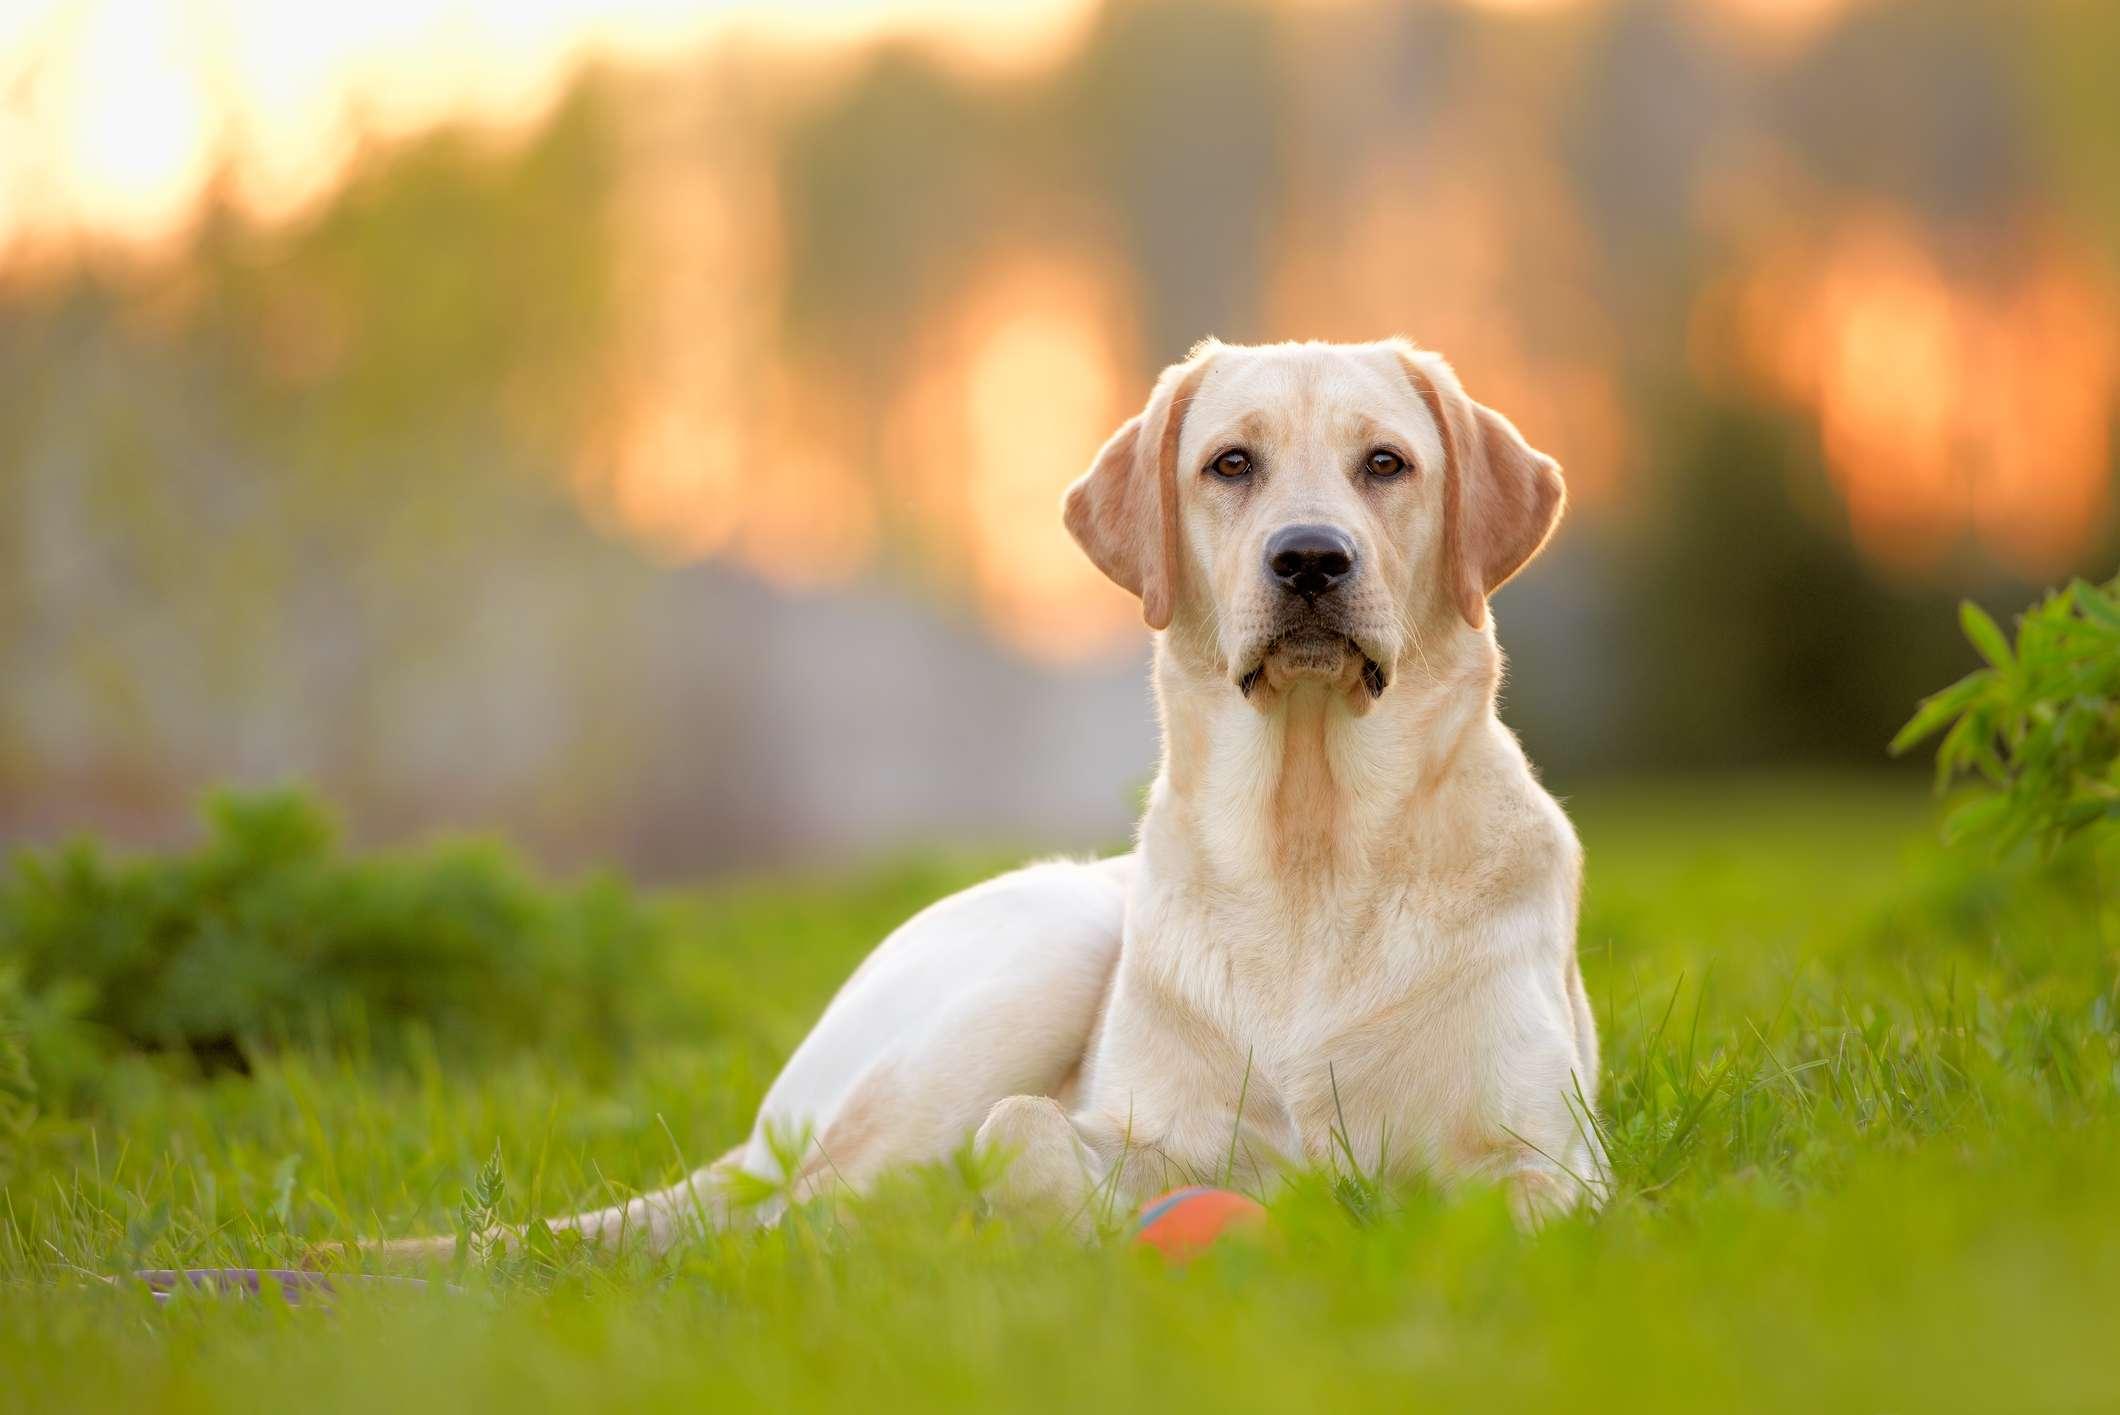 yellow Labrador retriever sitting in green grass